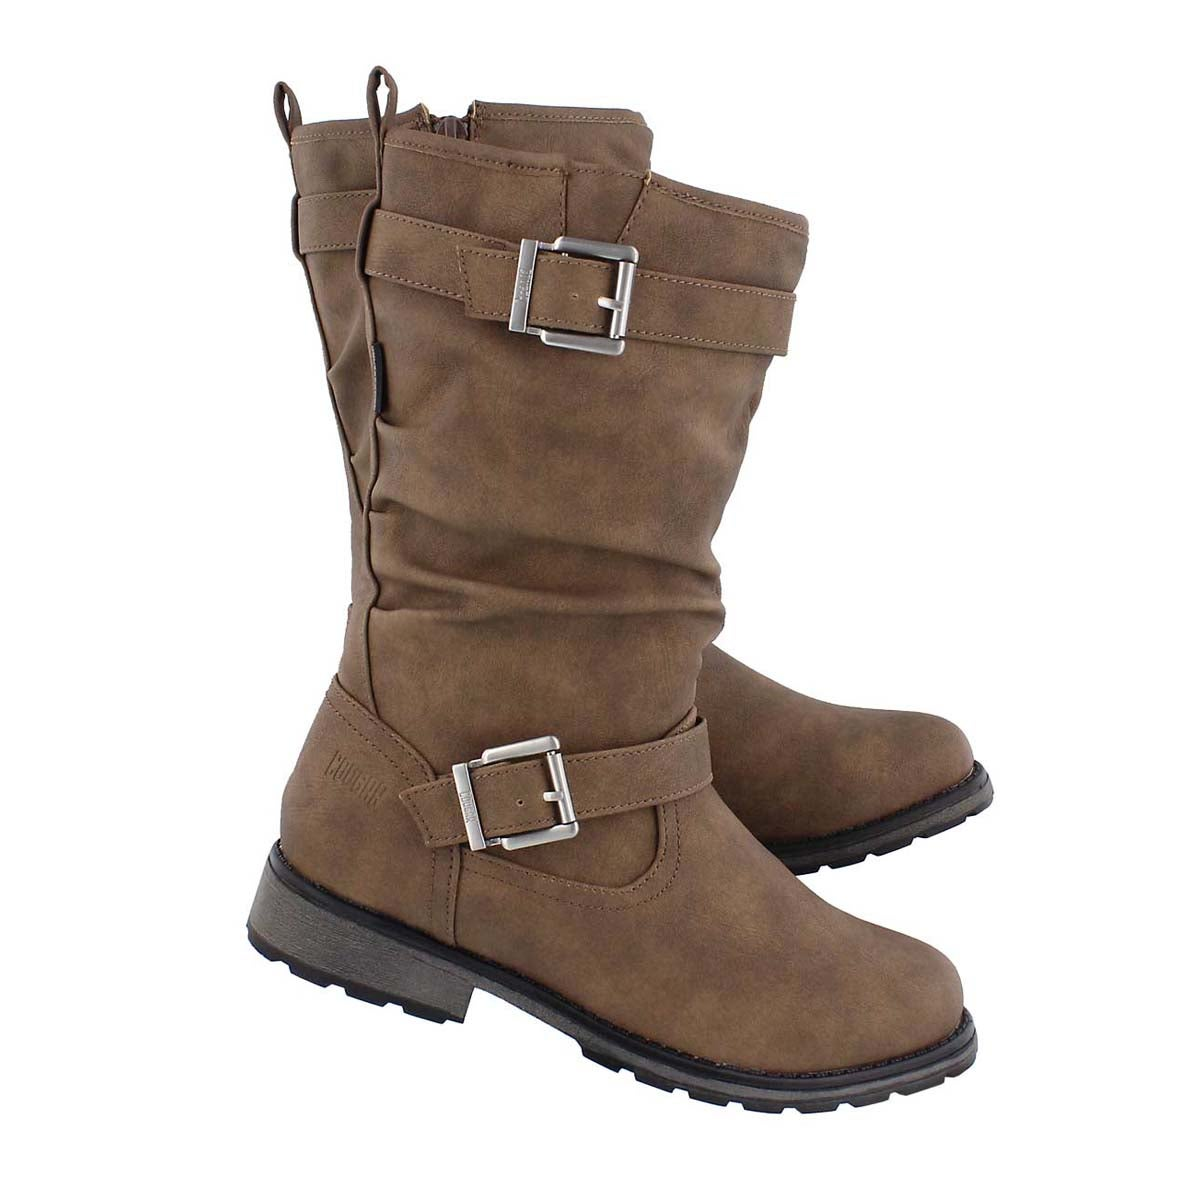 Grls Nota cafe wpf mid calf boot